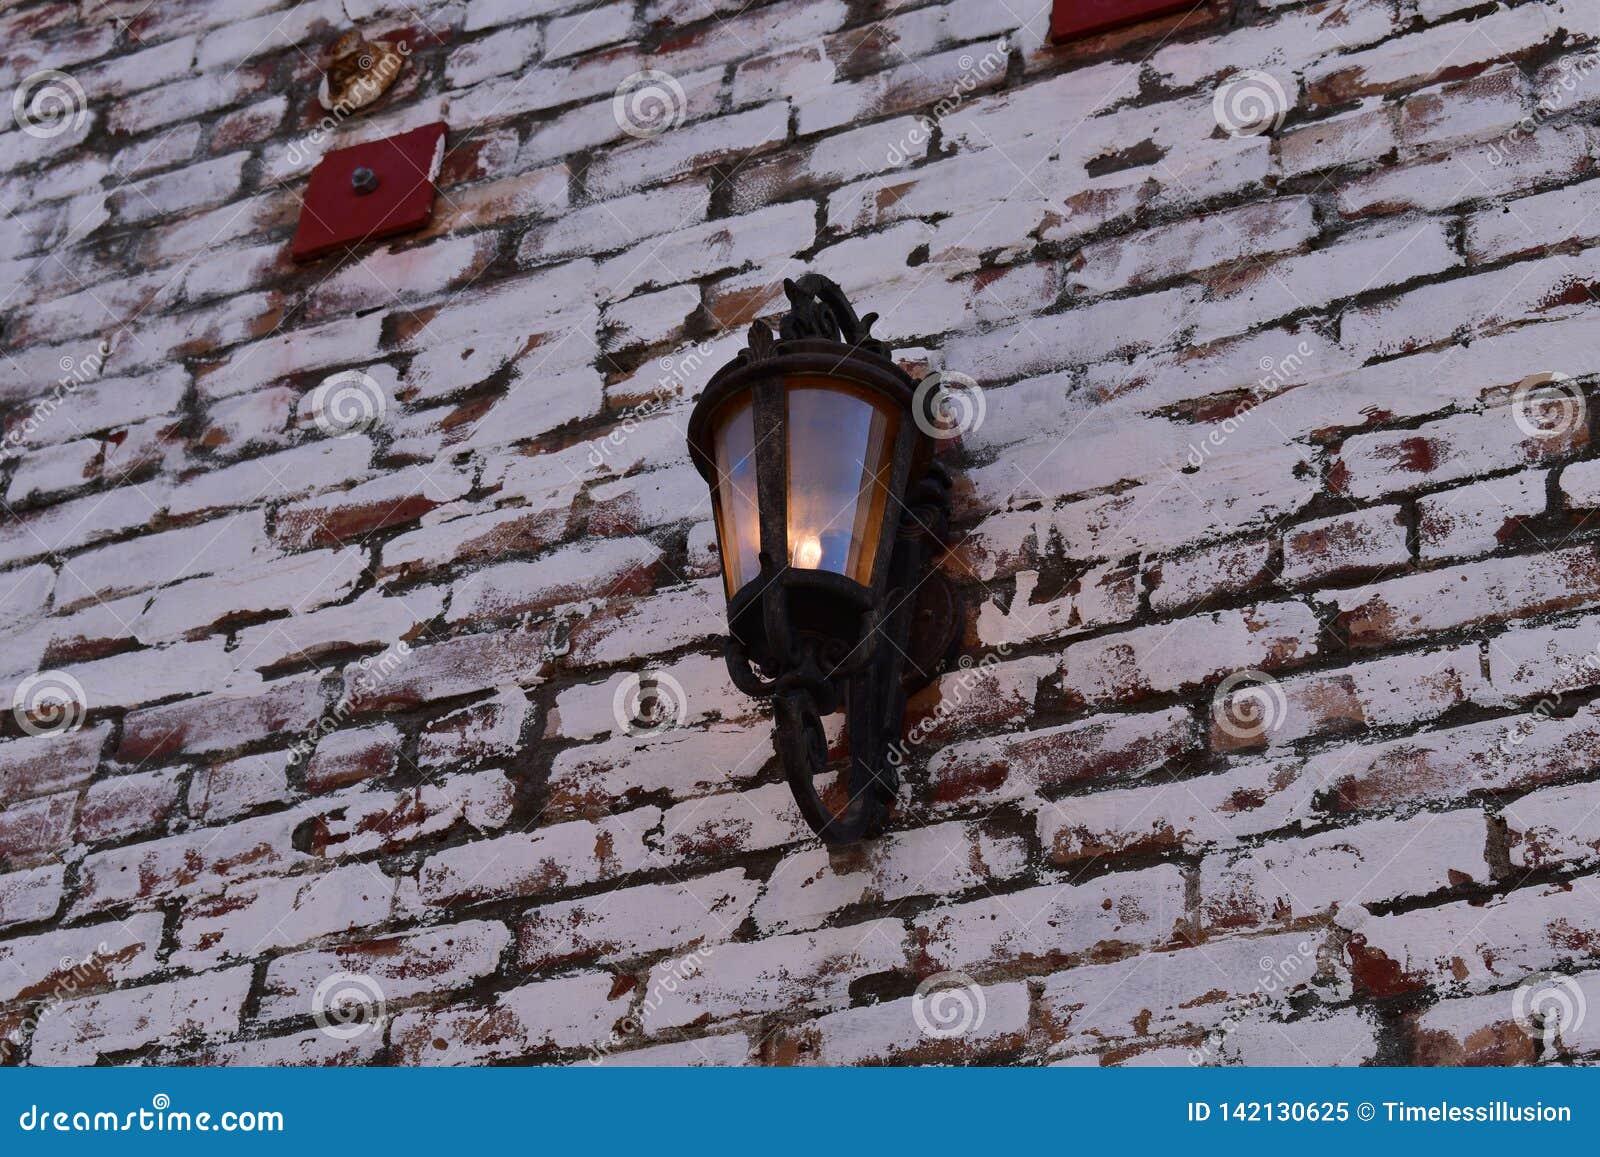 Lamp on a brick wall